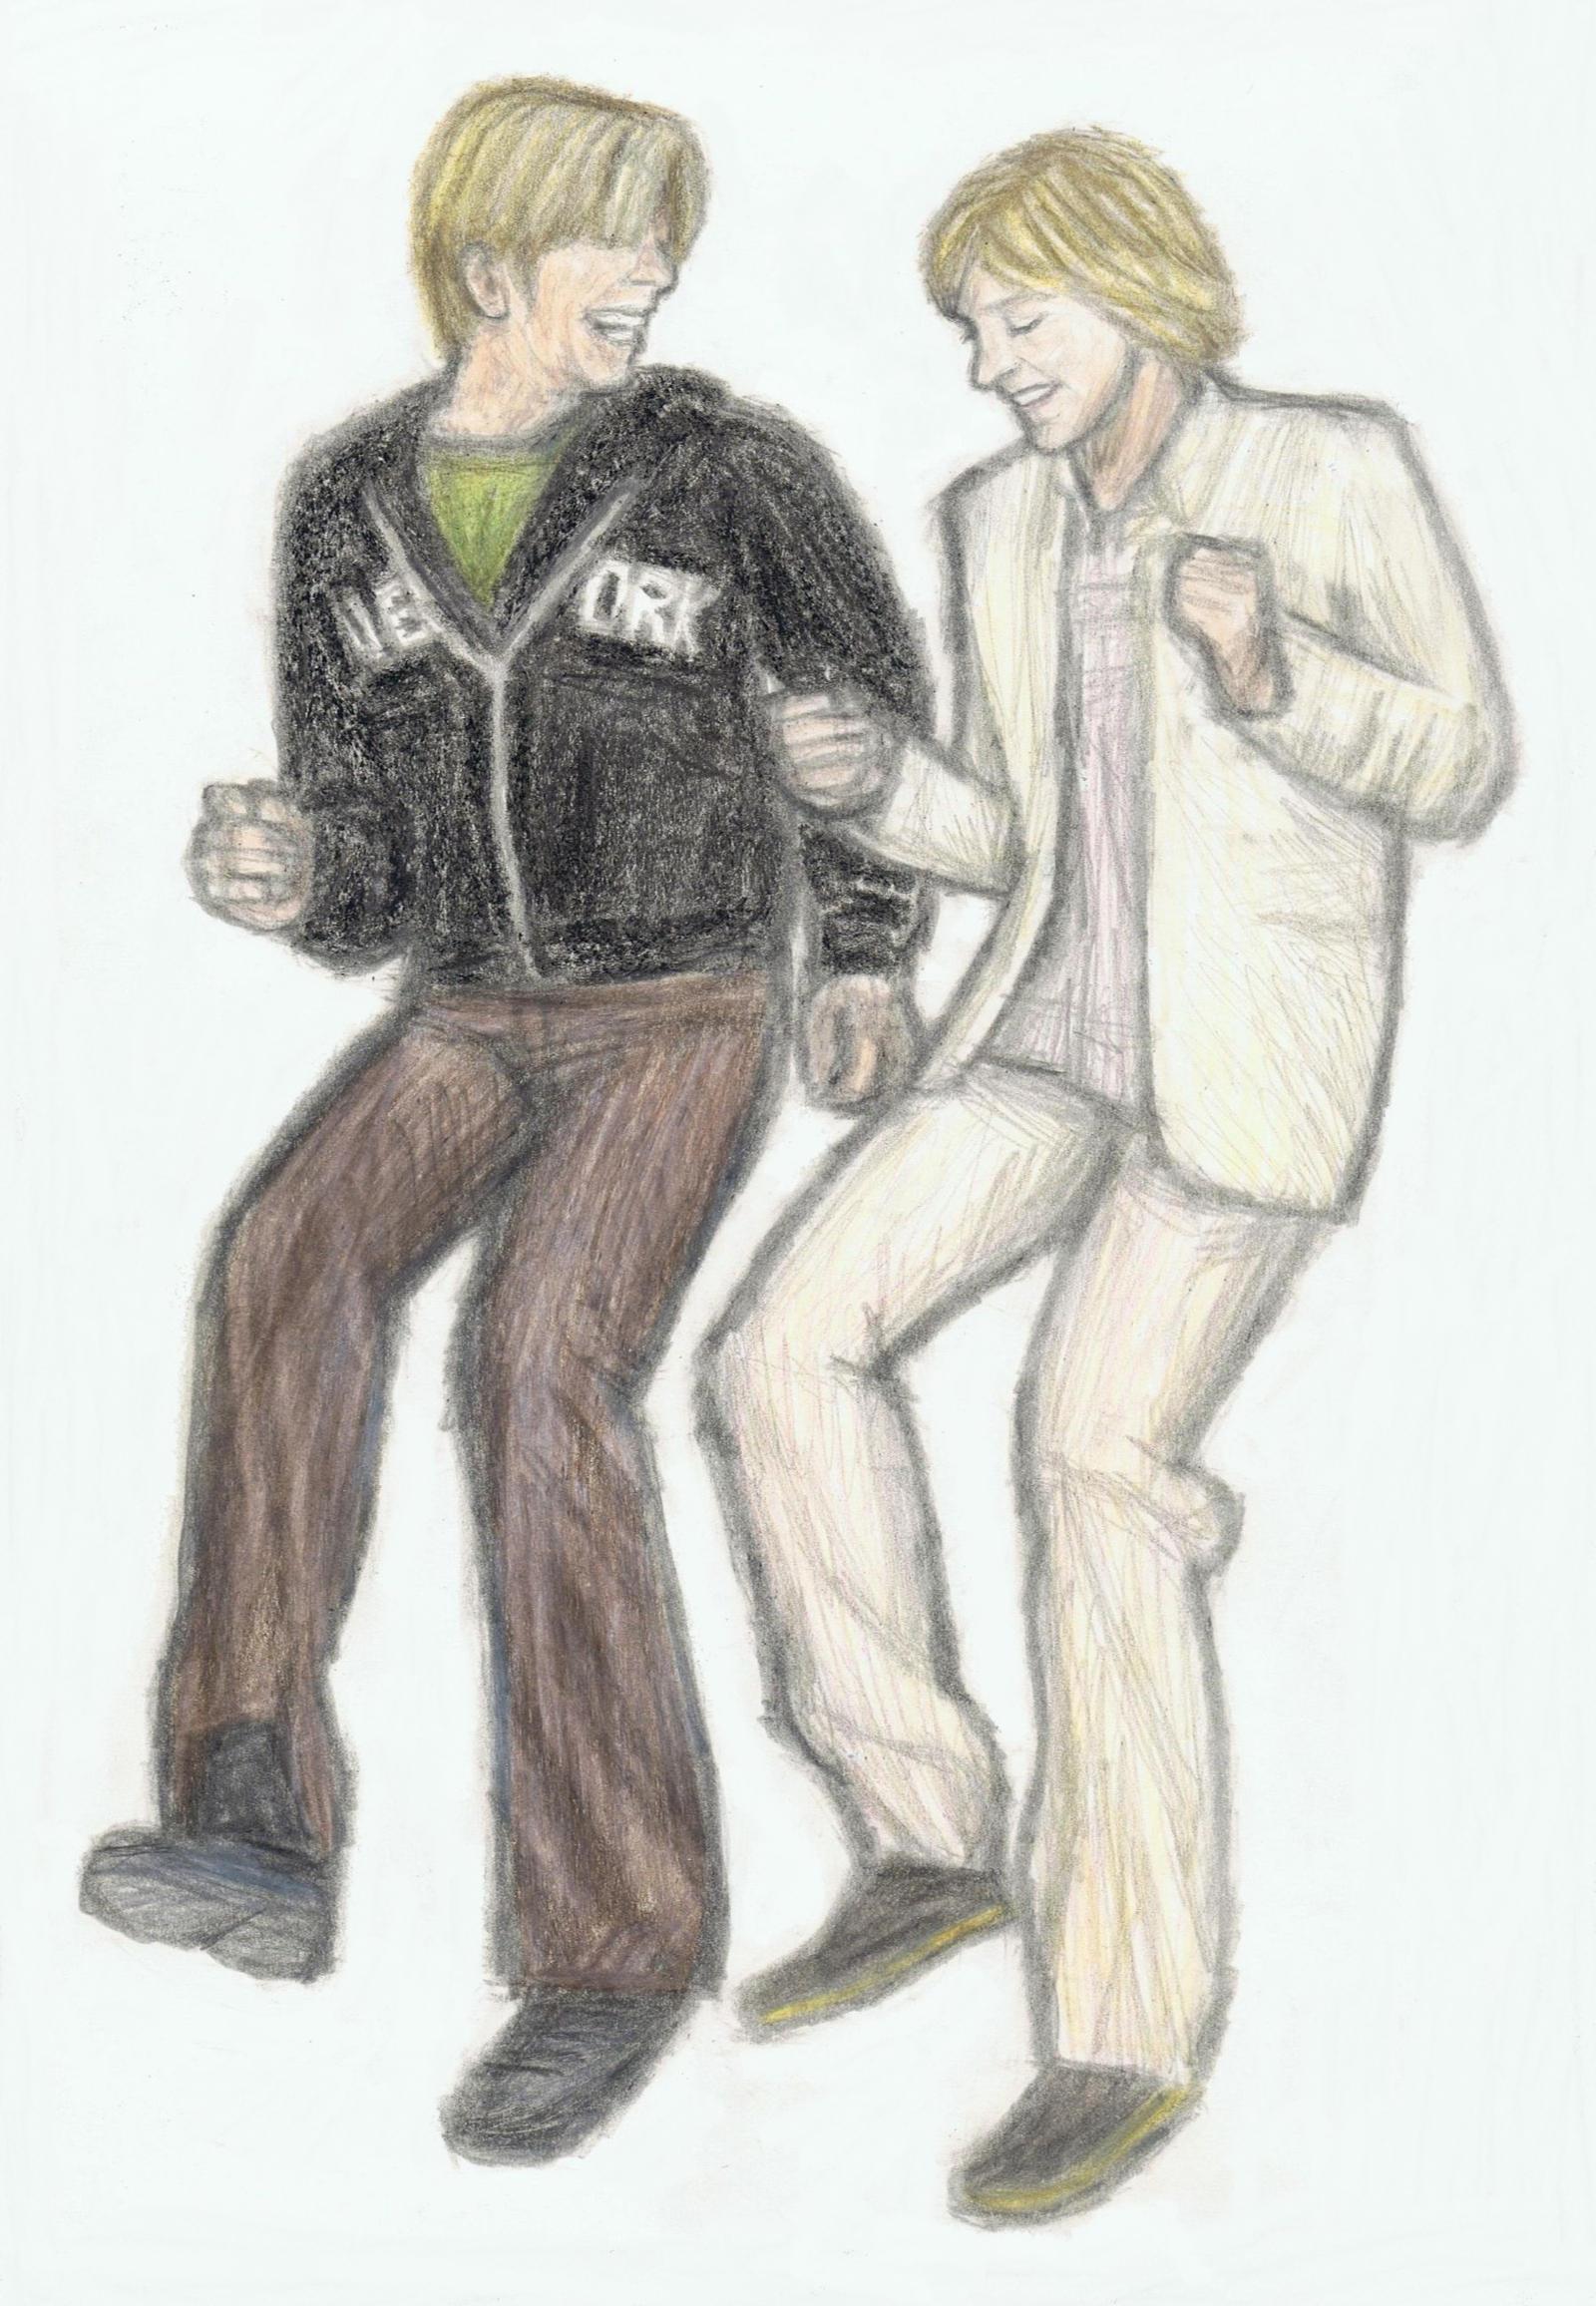 David Bowie and Ellen Degeneres by gagambo